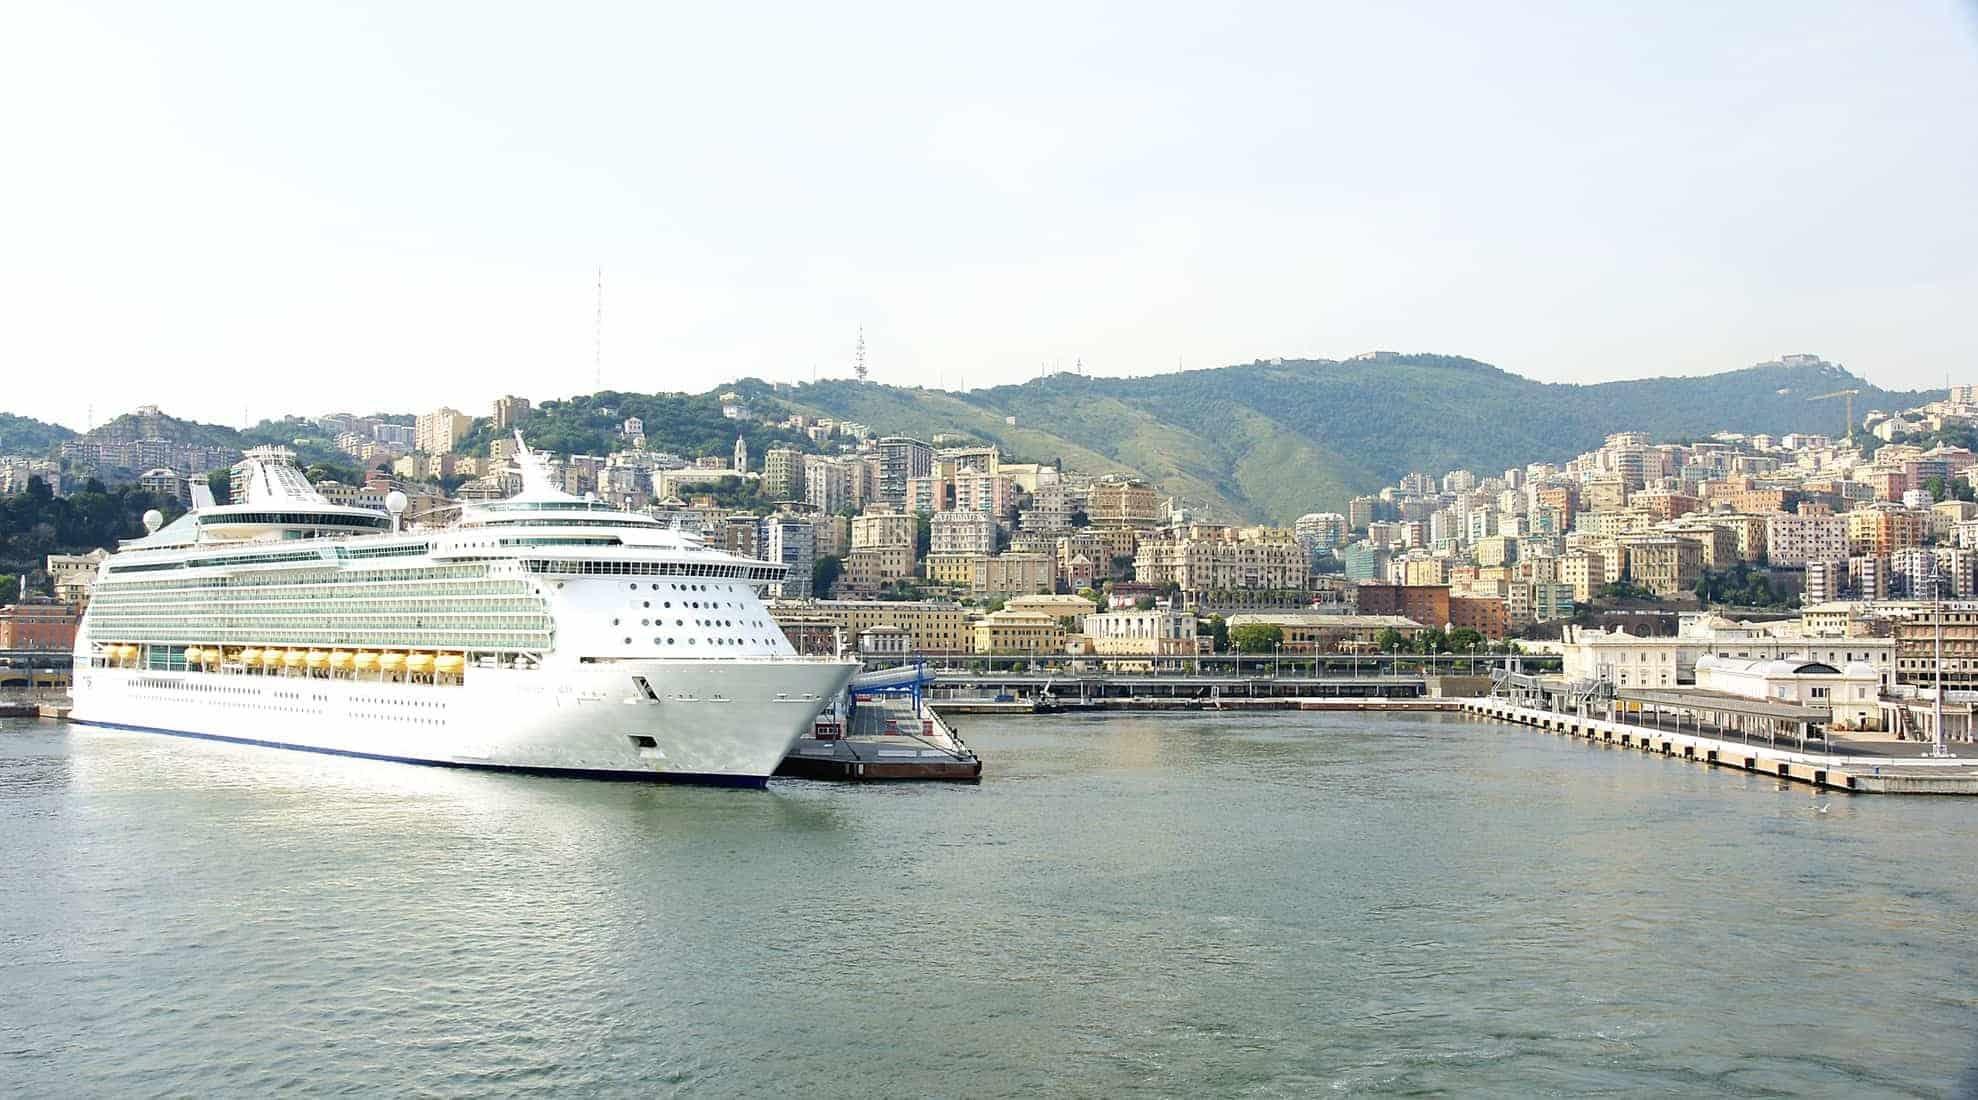 Transatlantic passenger terminal in Genoa, Italy